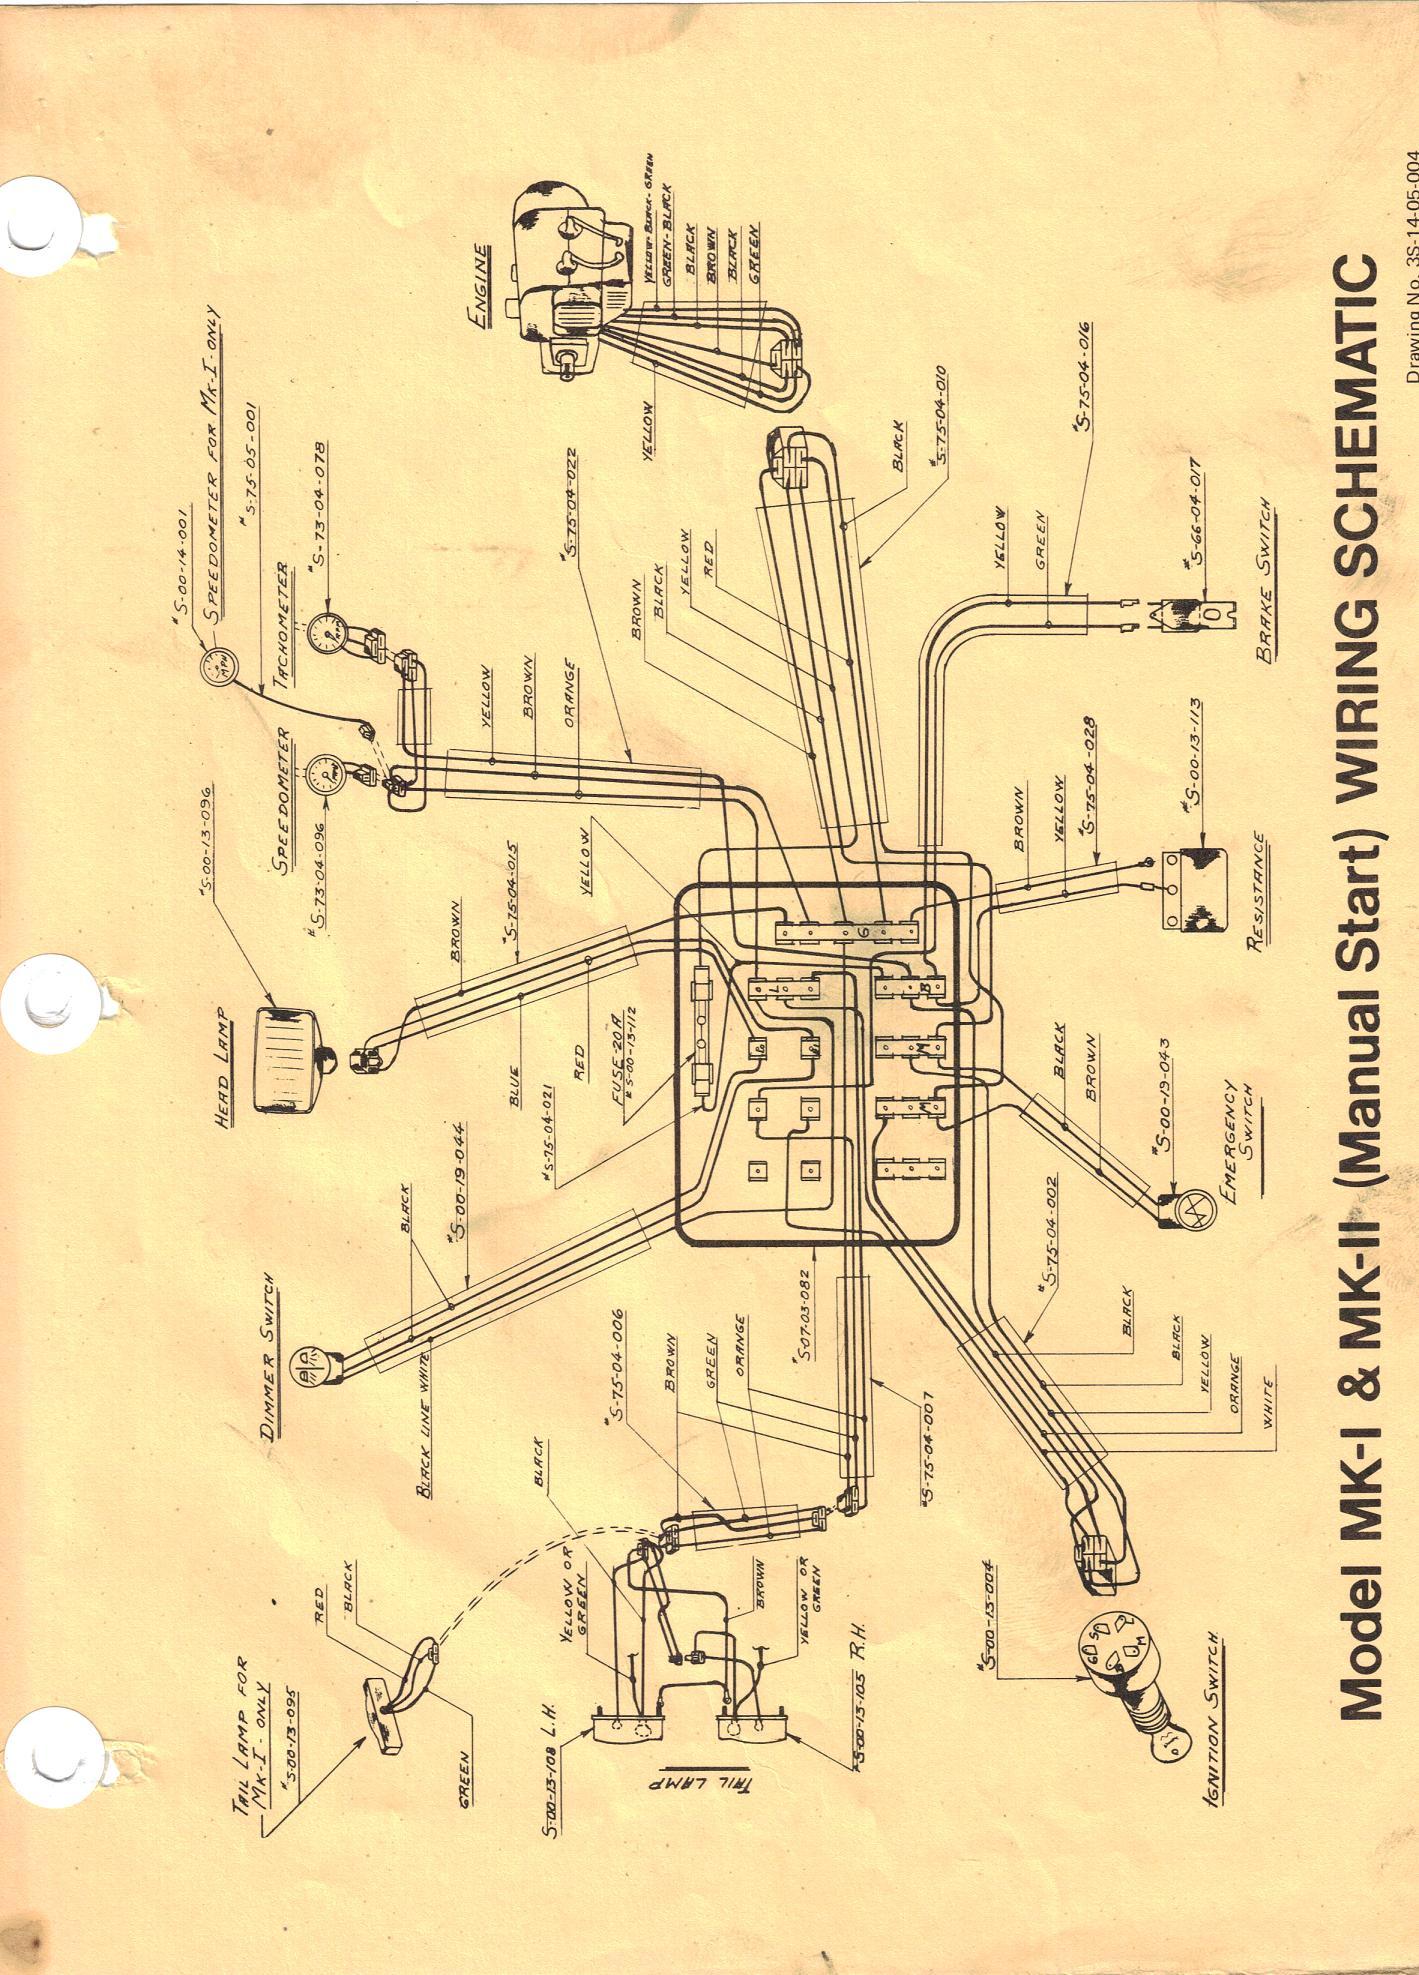 hight resolution of sno way wiring diagram sno get free image about wiring sno way wiring diagram sno way wiring diagram snow way plow